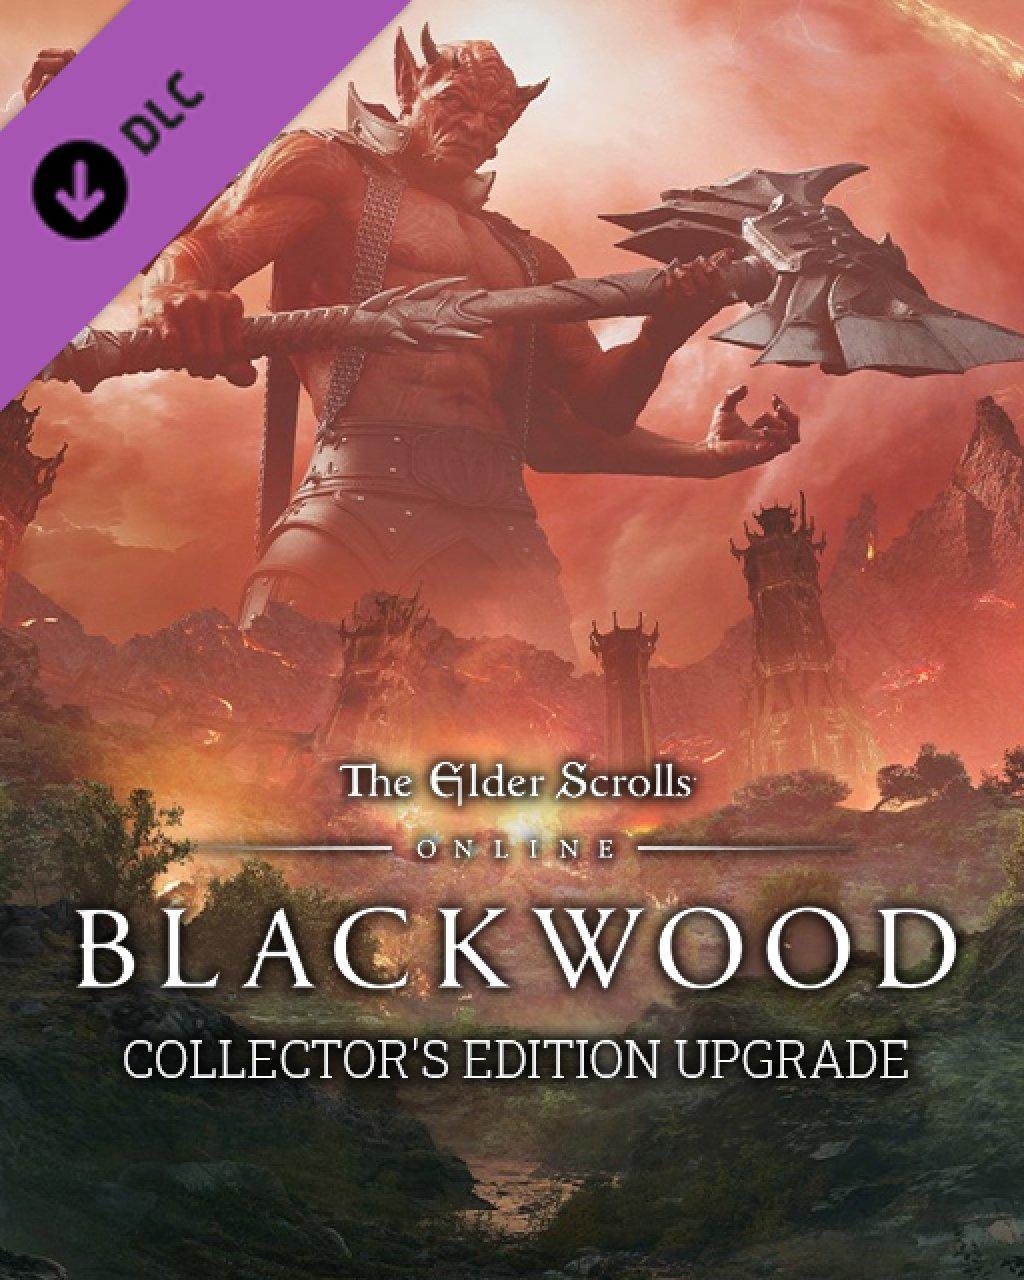 The Elder Scrolls Online Blackwood Collector's Edition Upgrade